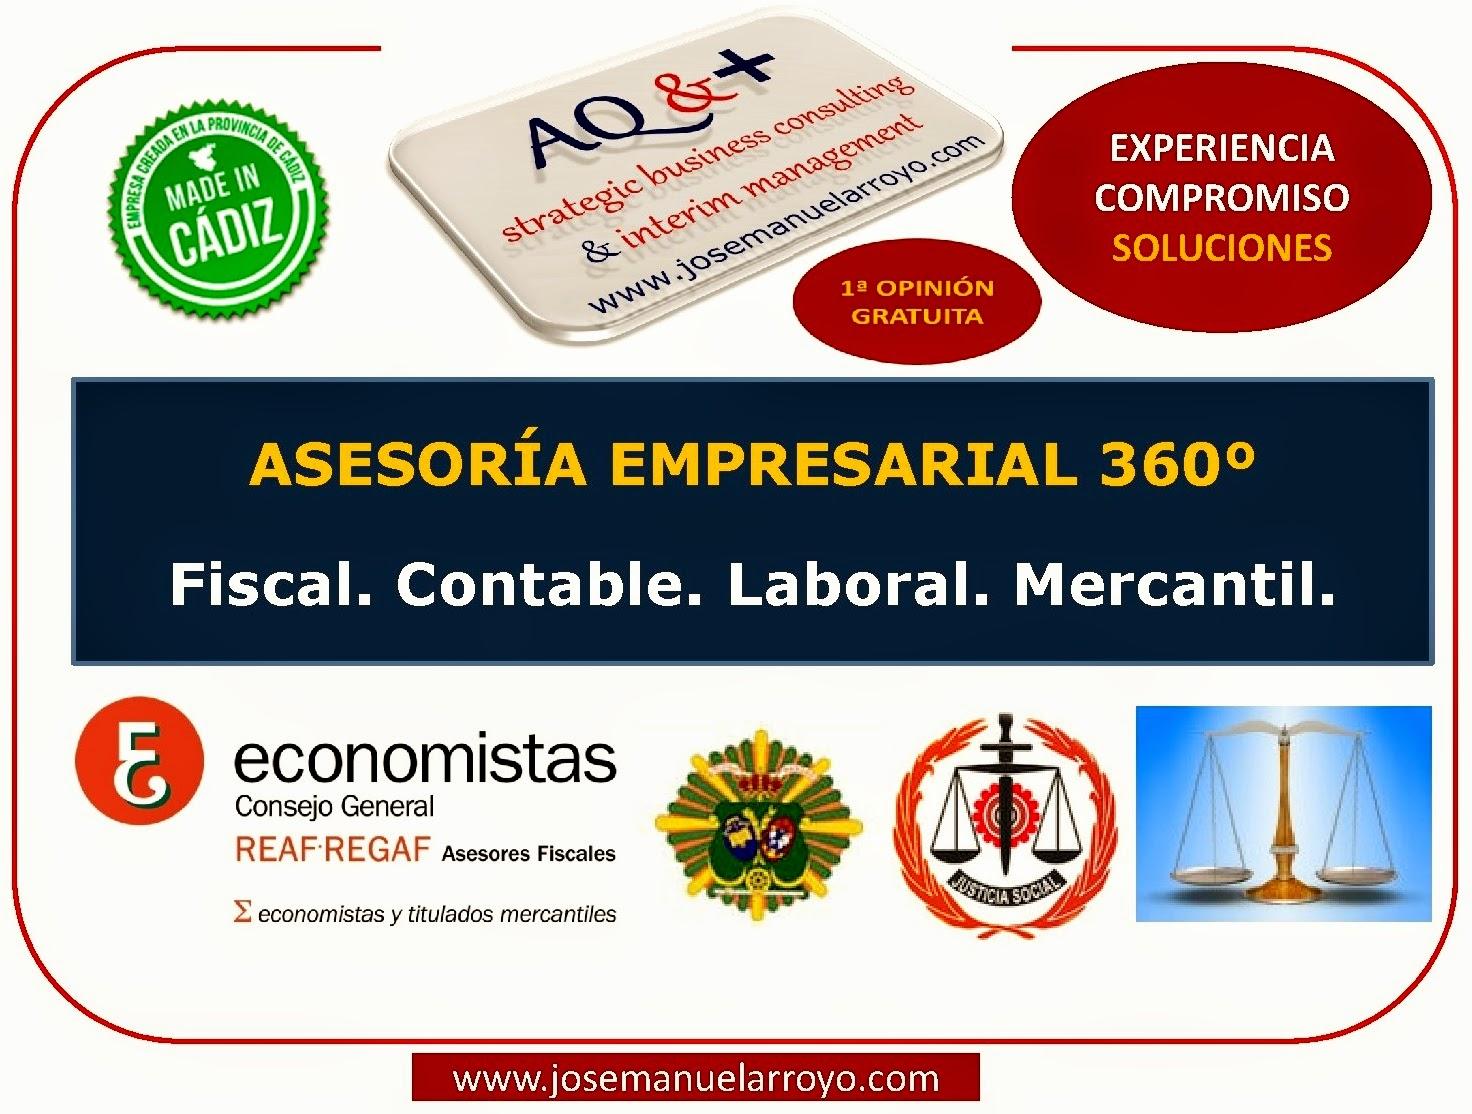 Asesoramiento Empresarial Global 360º